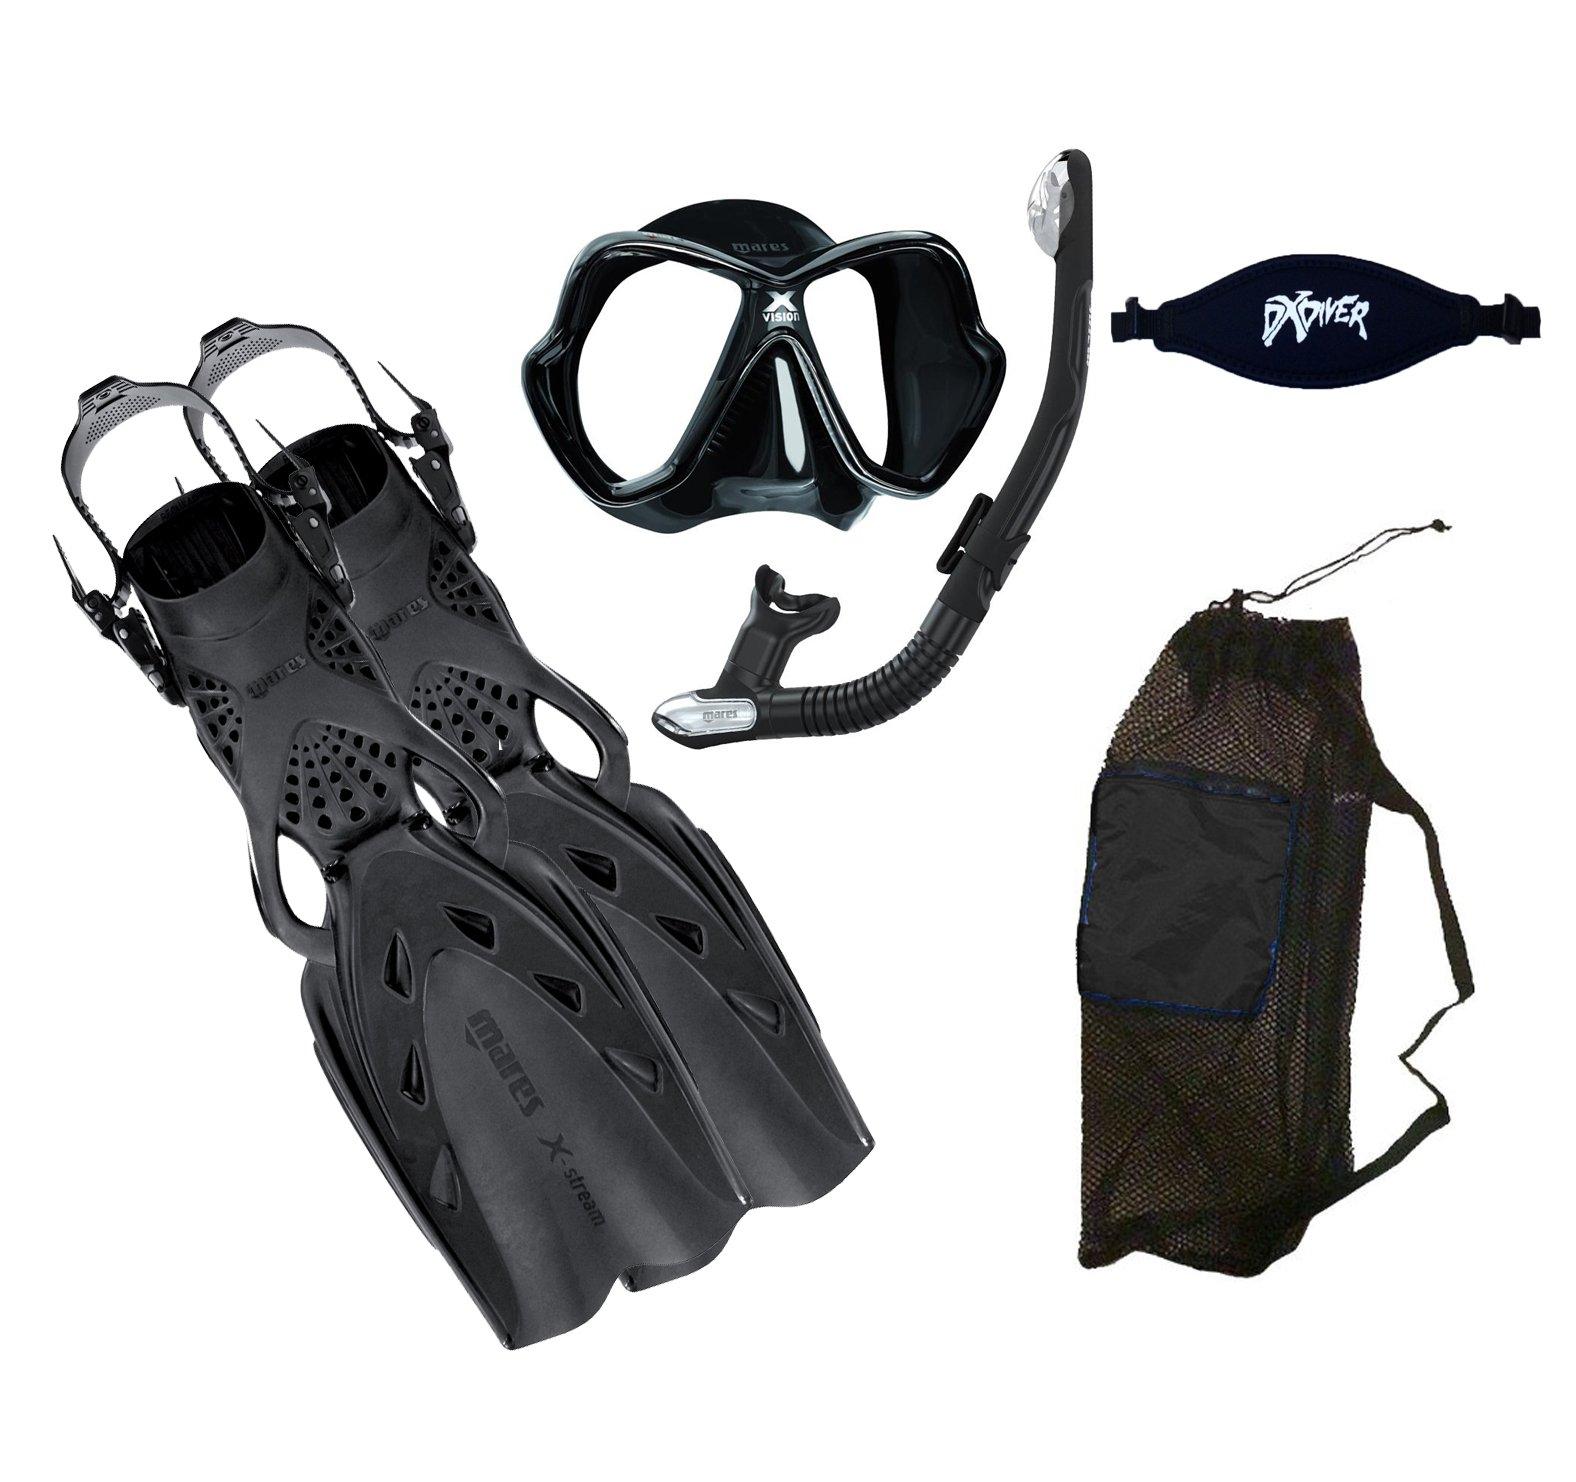 MARES X-Stream Fins X-Vision LiquidSkin Mask Ergo Dry Snorkel DXDiver Mask Strap Mesh Gear Bag Snorkeling Scuba Diving Size Regular, Black